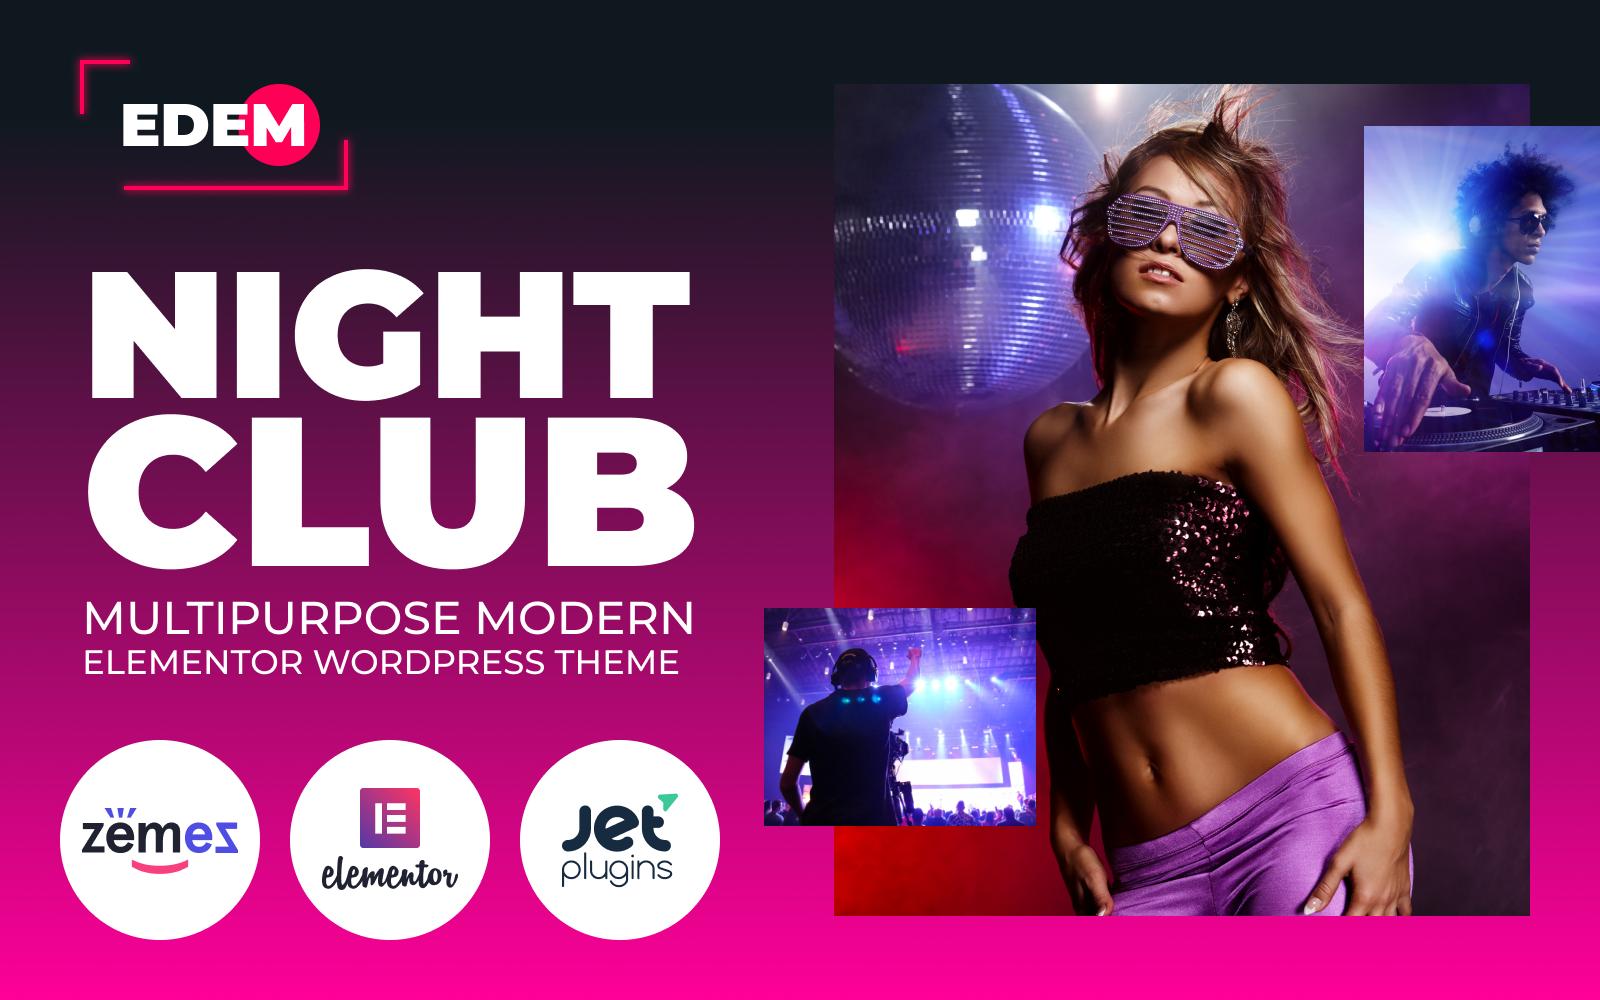 Responsivt Edem - Night Club Multipurpose Modern Elementor WordPress-tema #84736